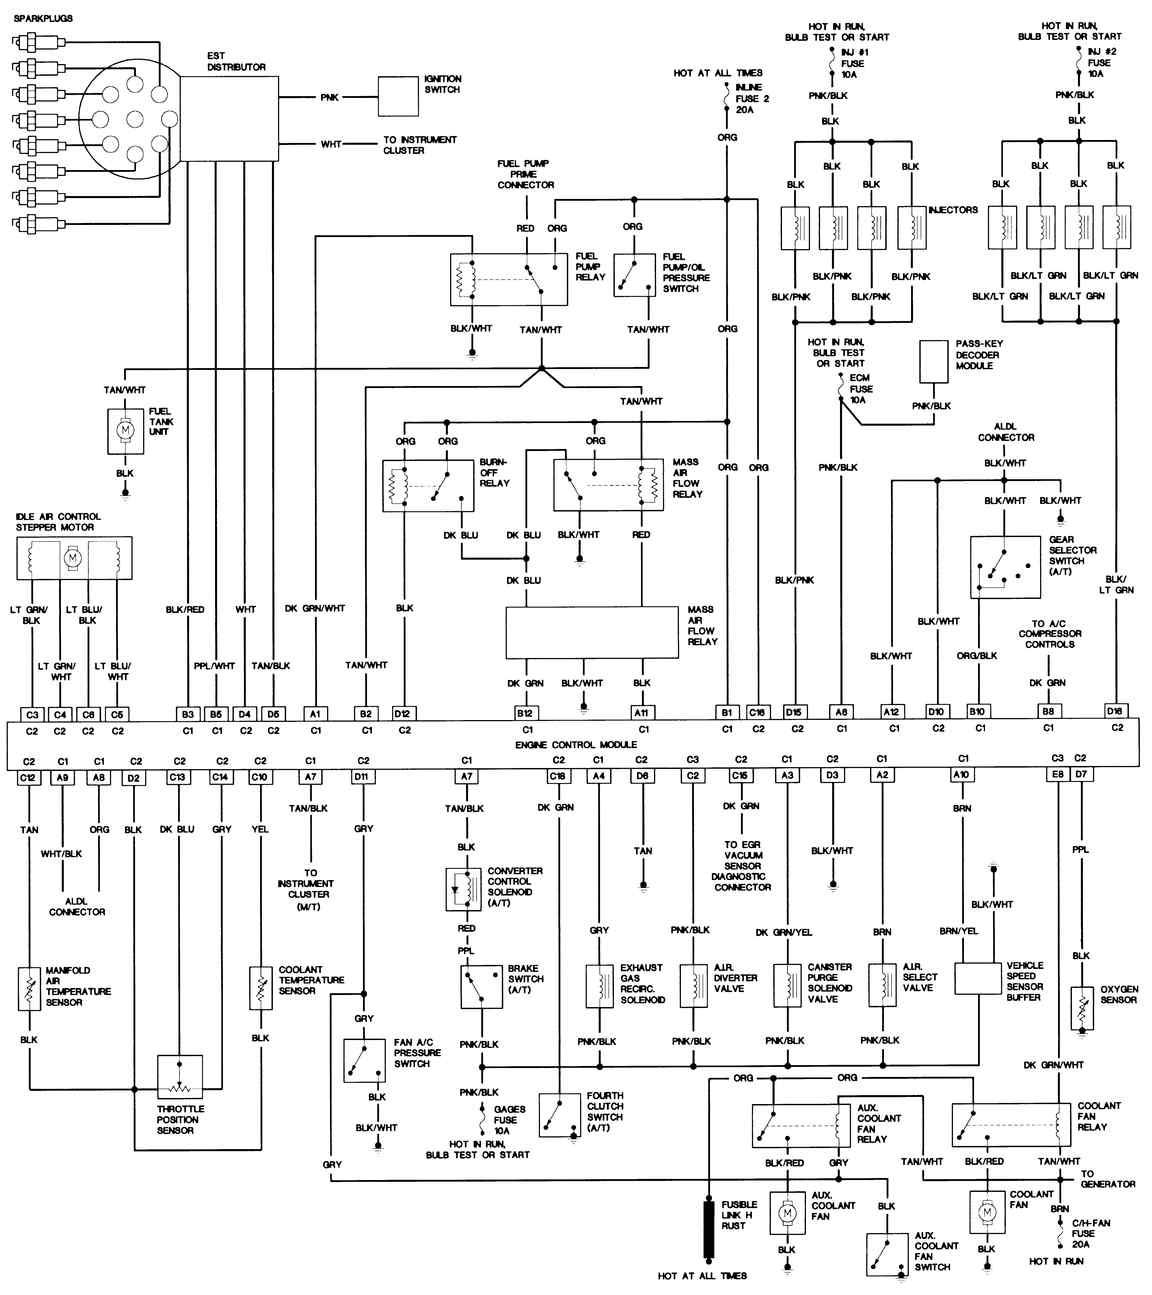 hight resolution of 1991 firebird formula wiring diagram example electrical wiring rh huntervalleyhotels co 1992 pontiac firebird wiring diagram